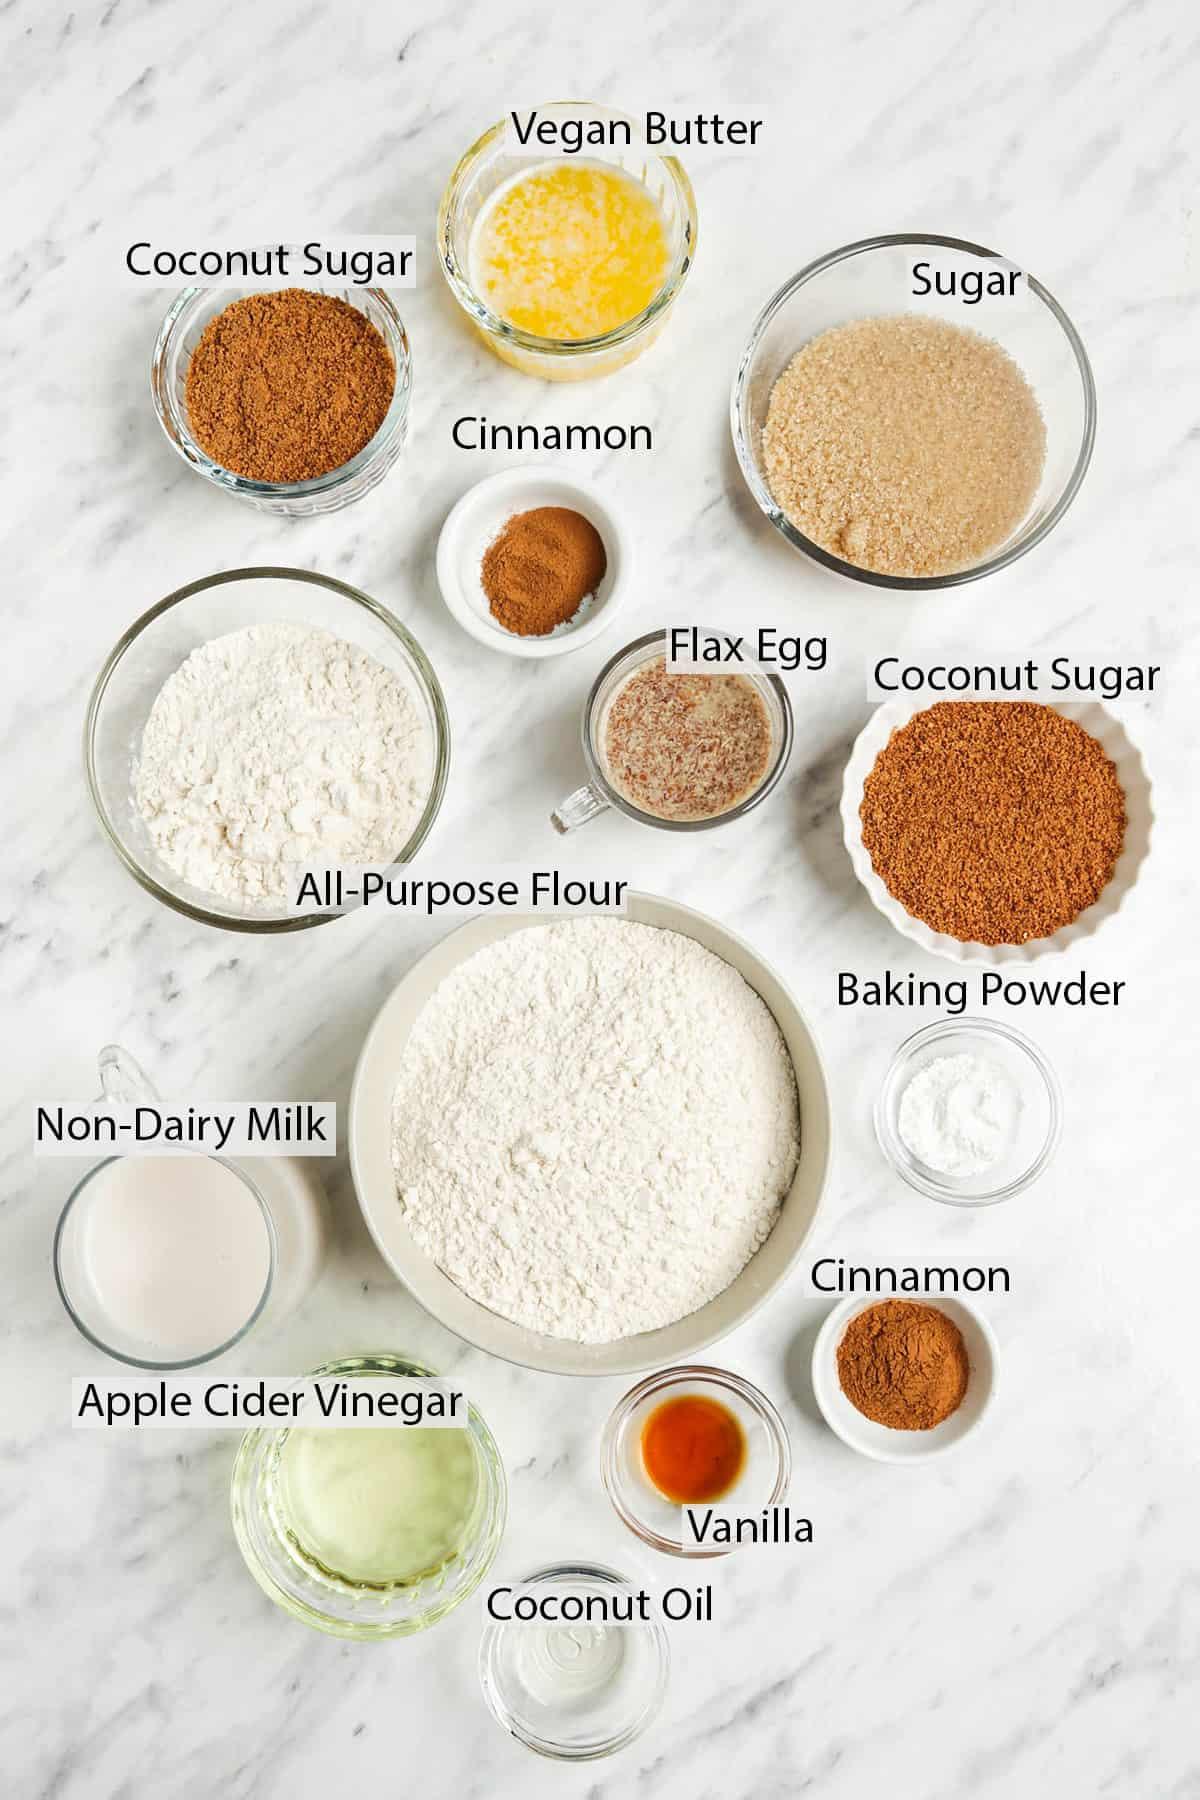 coconut sugar, cinnamon, sugar, flax egg, flour, baking powder, non dairy milk, apple cider vinegar, vanilla, and coconut oil